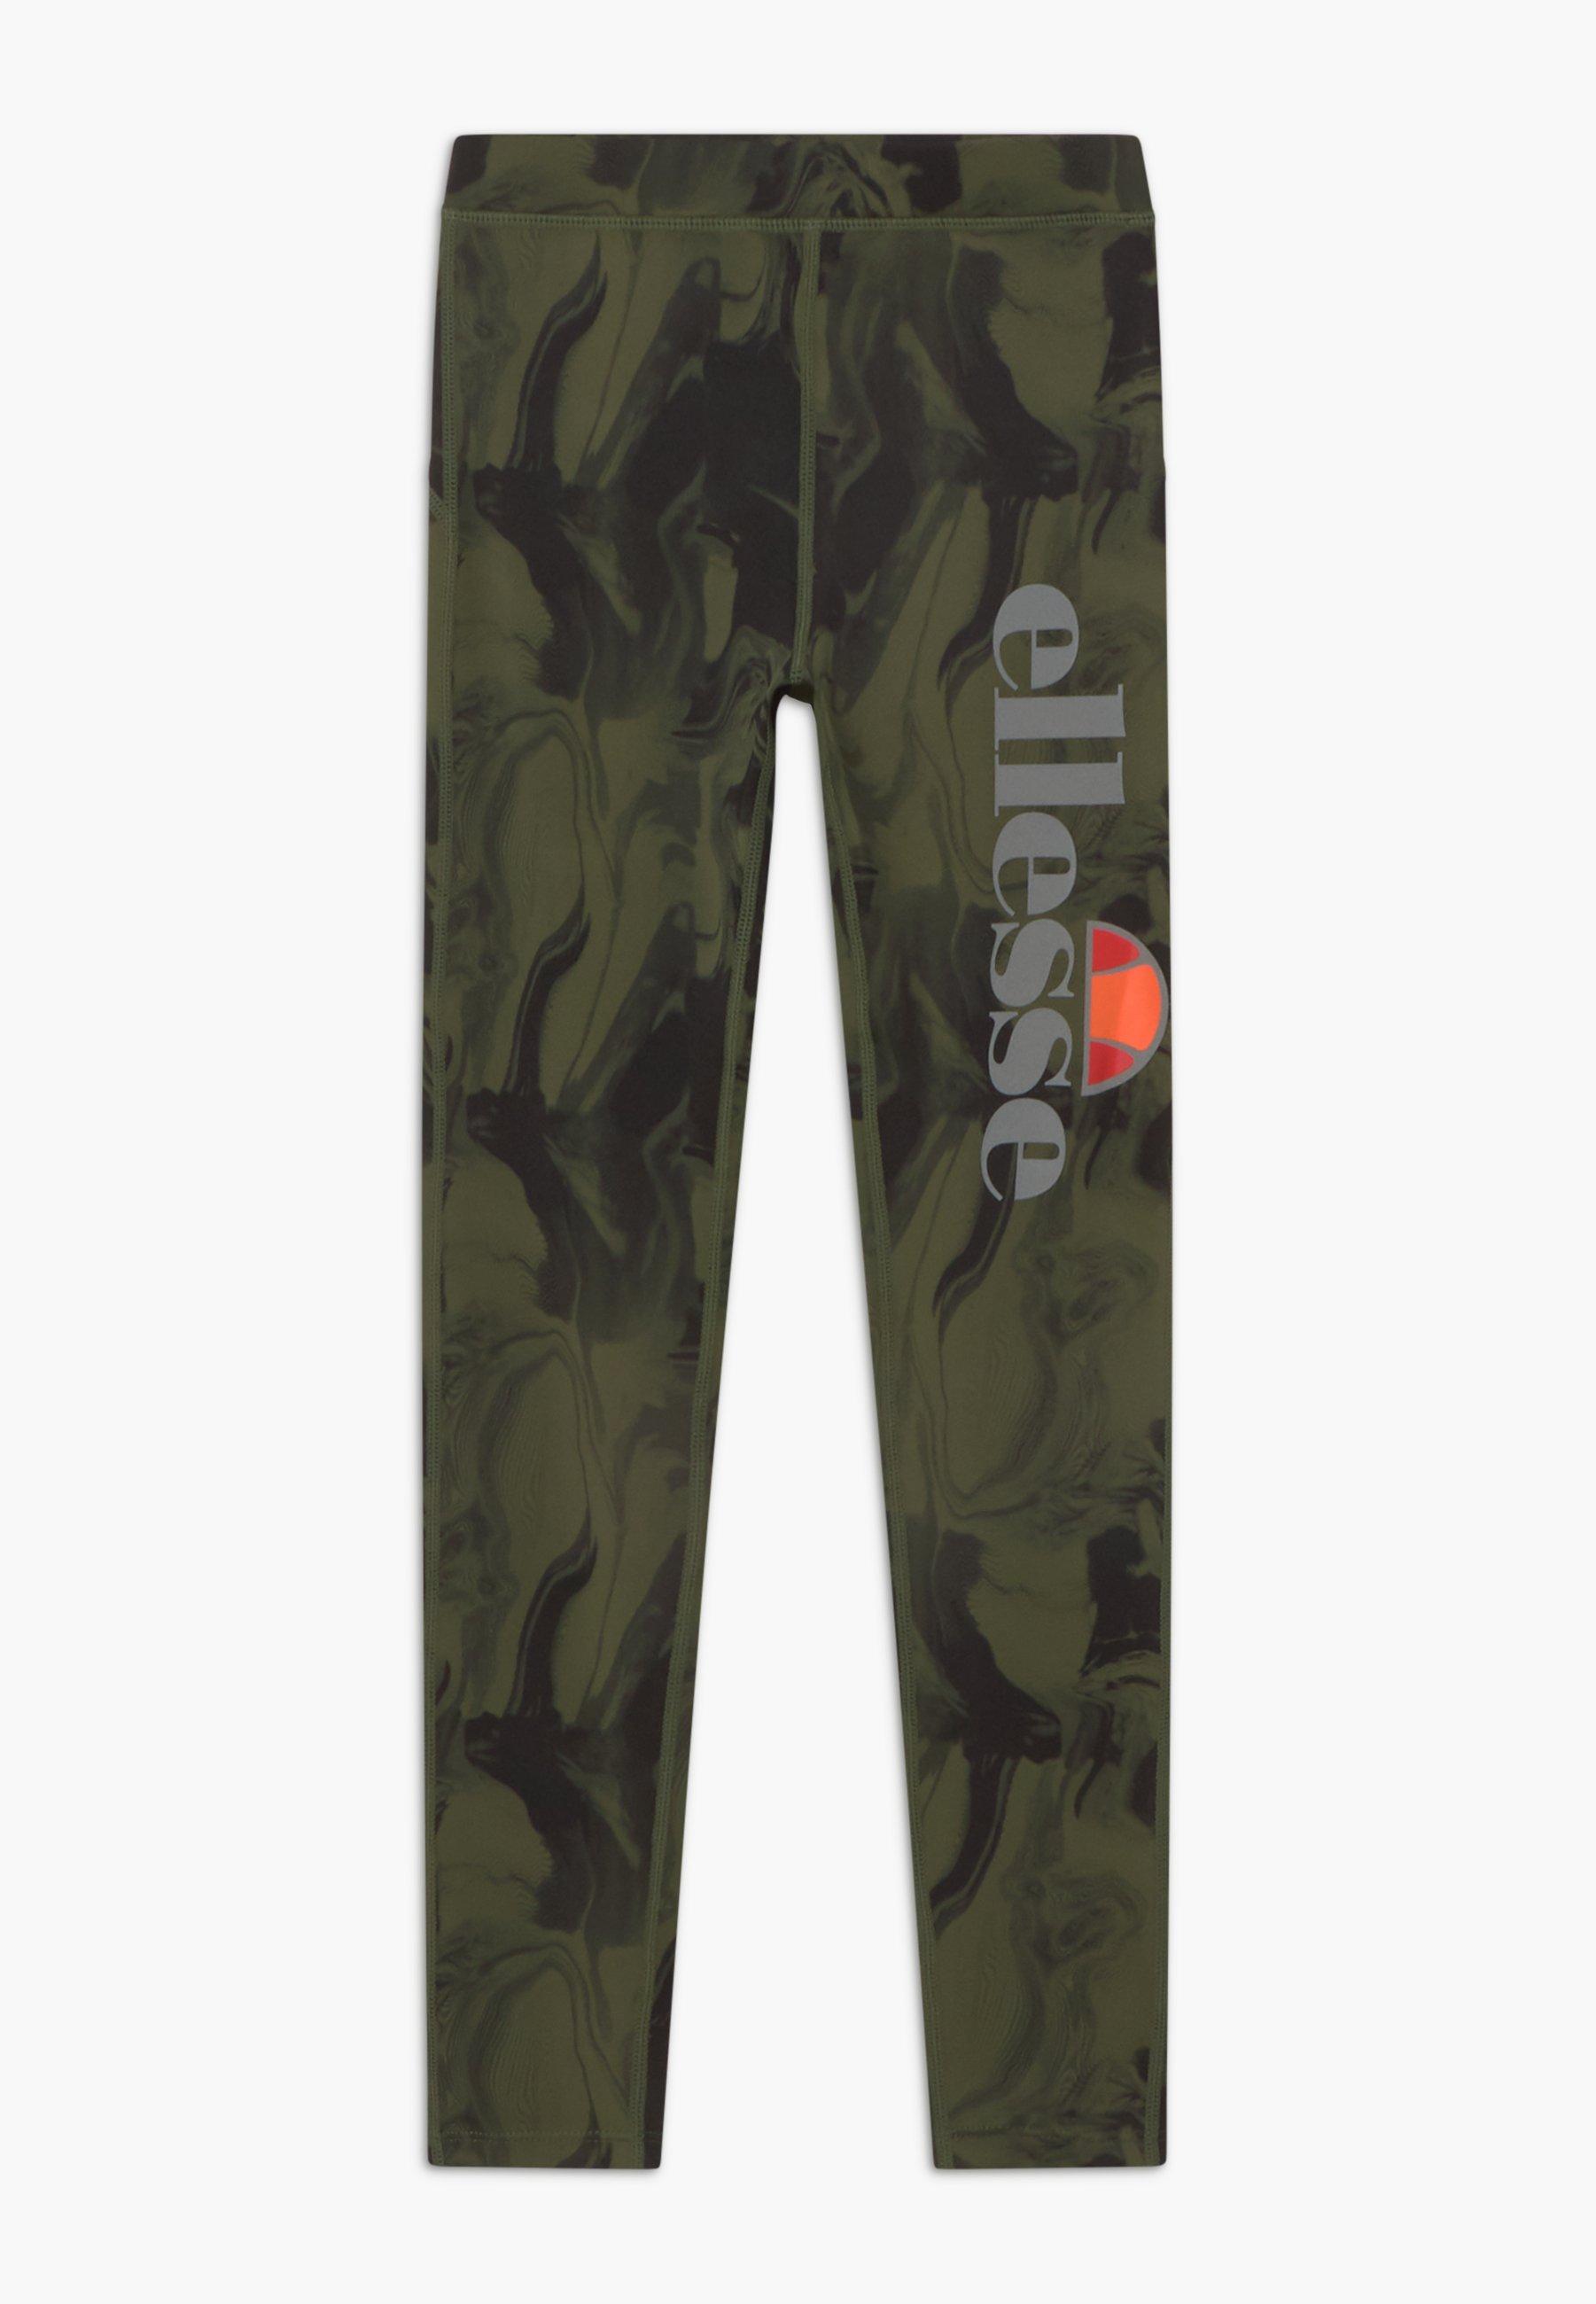 Ellesse BRULAN PERFORMANCE LEGGING - Legginsy - dark green - Ubranka dla dzieci